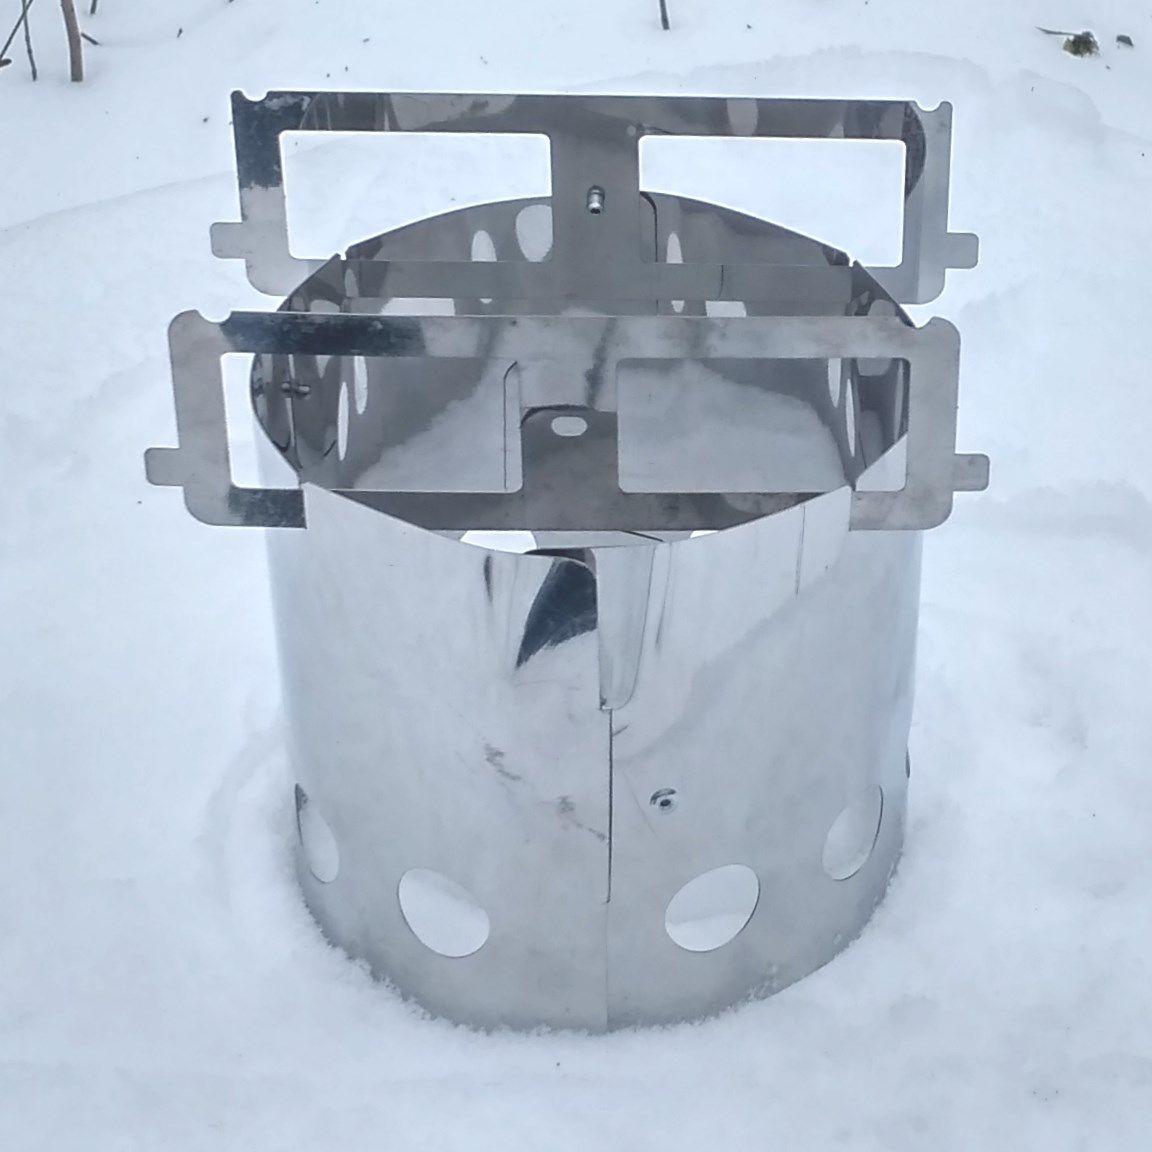 Печка щепочница BM Easy Hike Sliver BM - фото 2